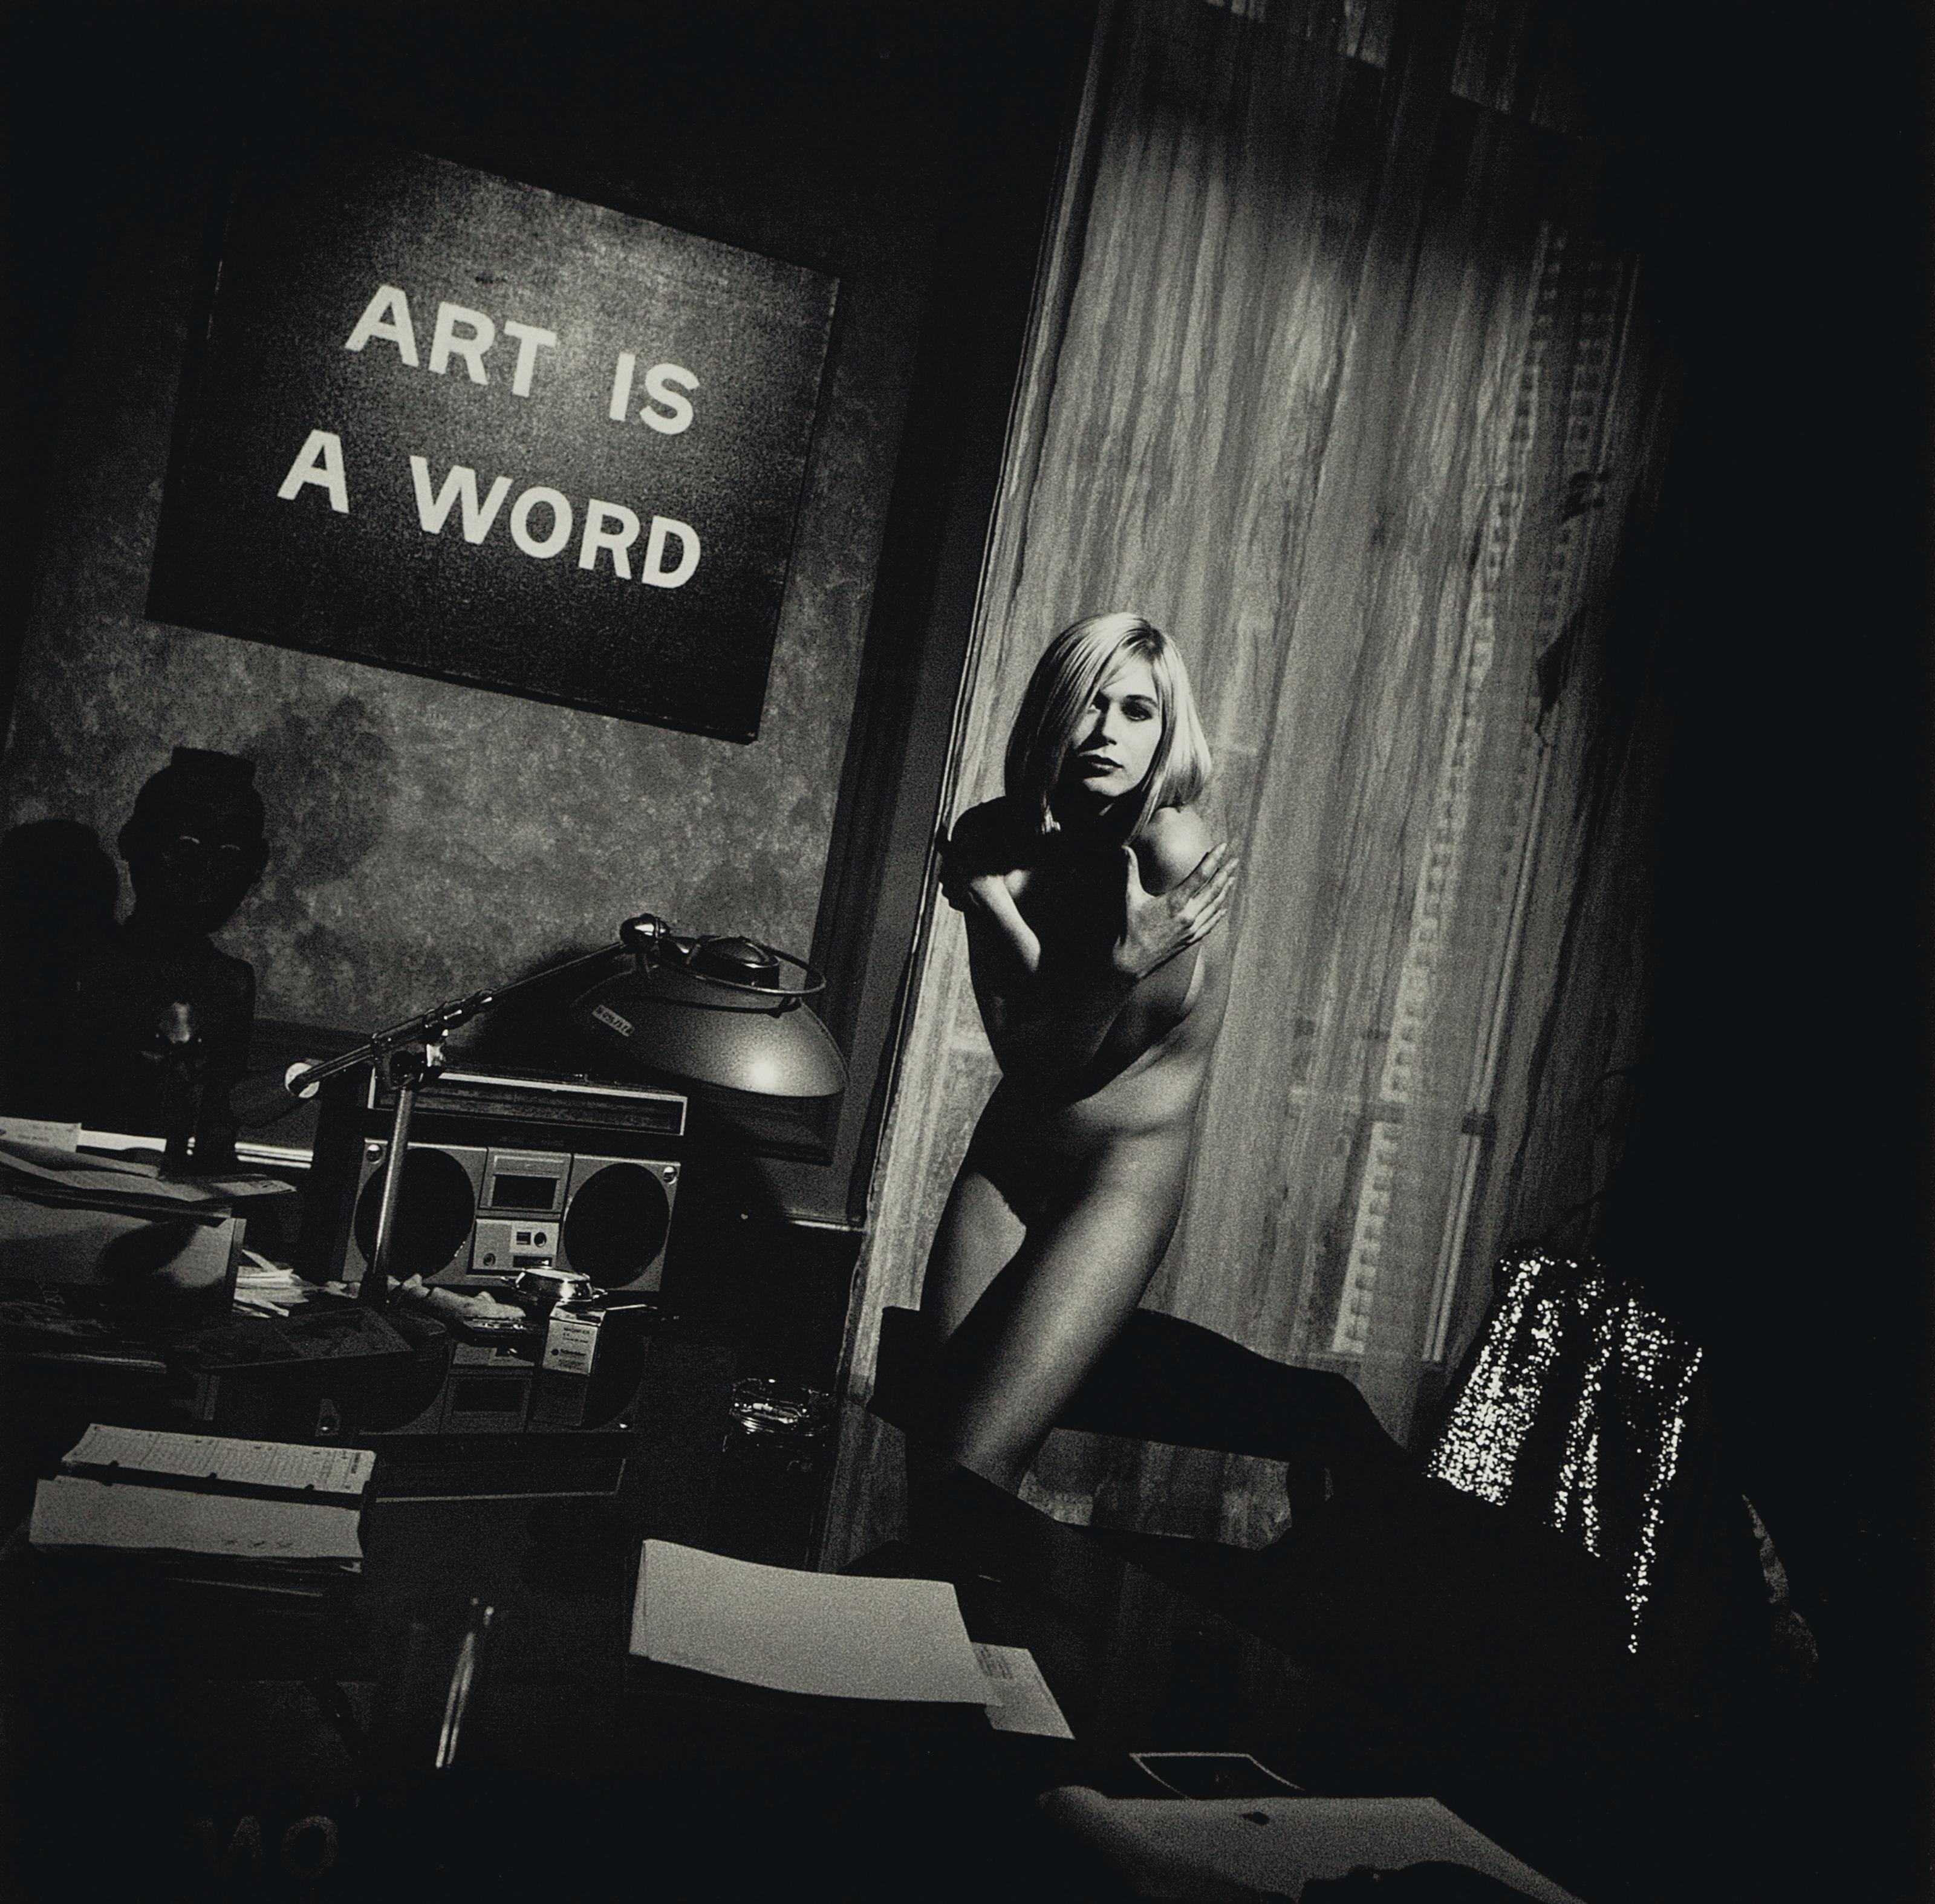 'Art is a Word', Paris, November 1988